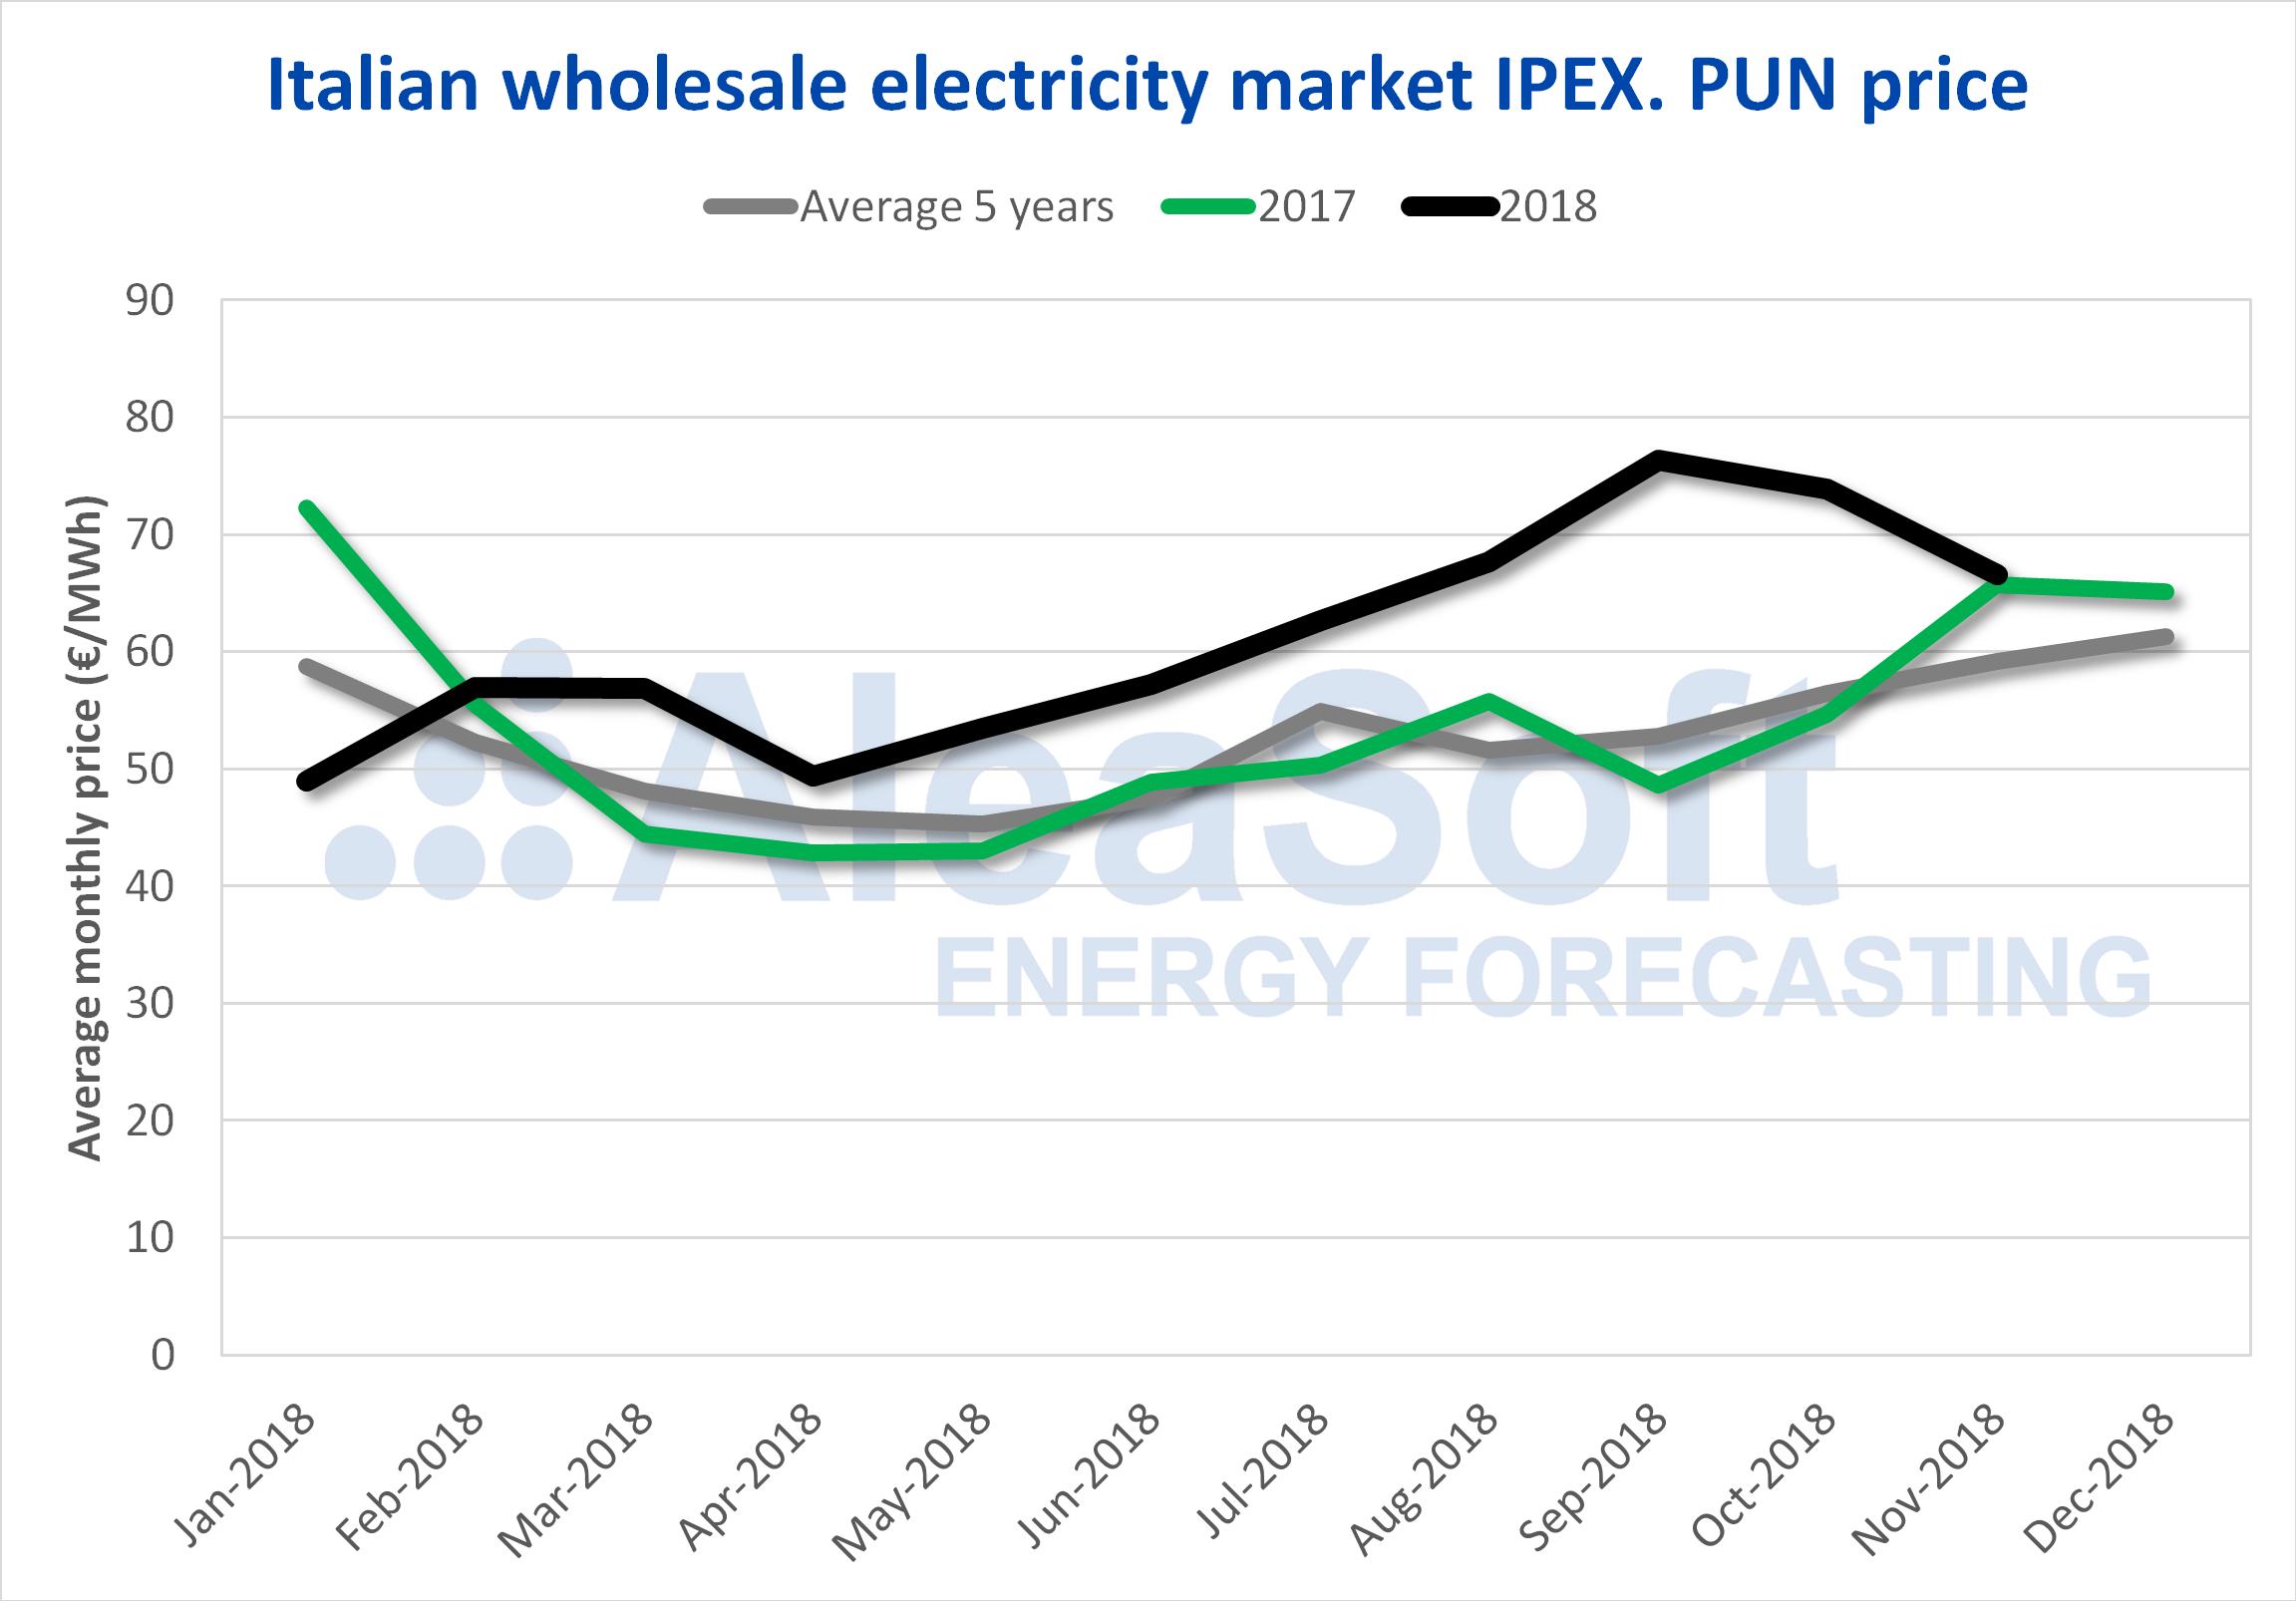 AleaSoft - Italian electricity market price